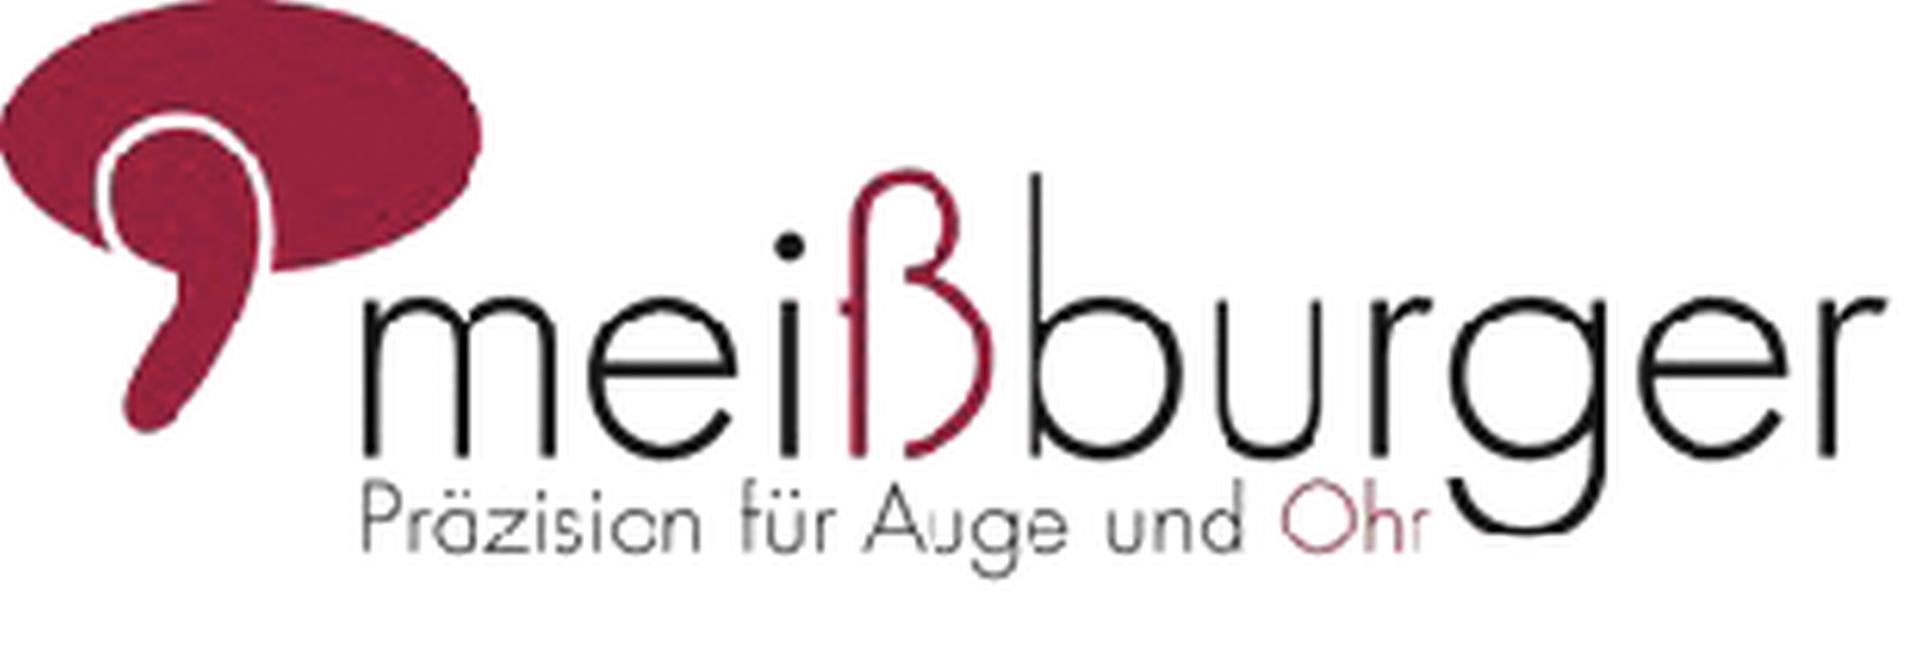 Hans Meißburger GmbH